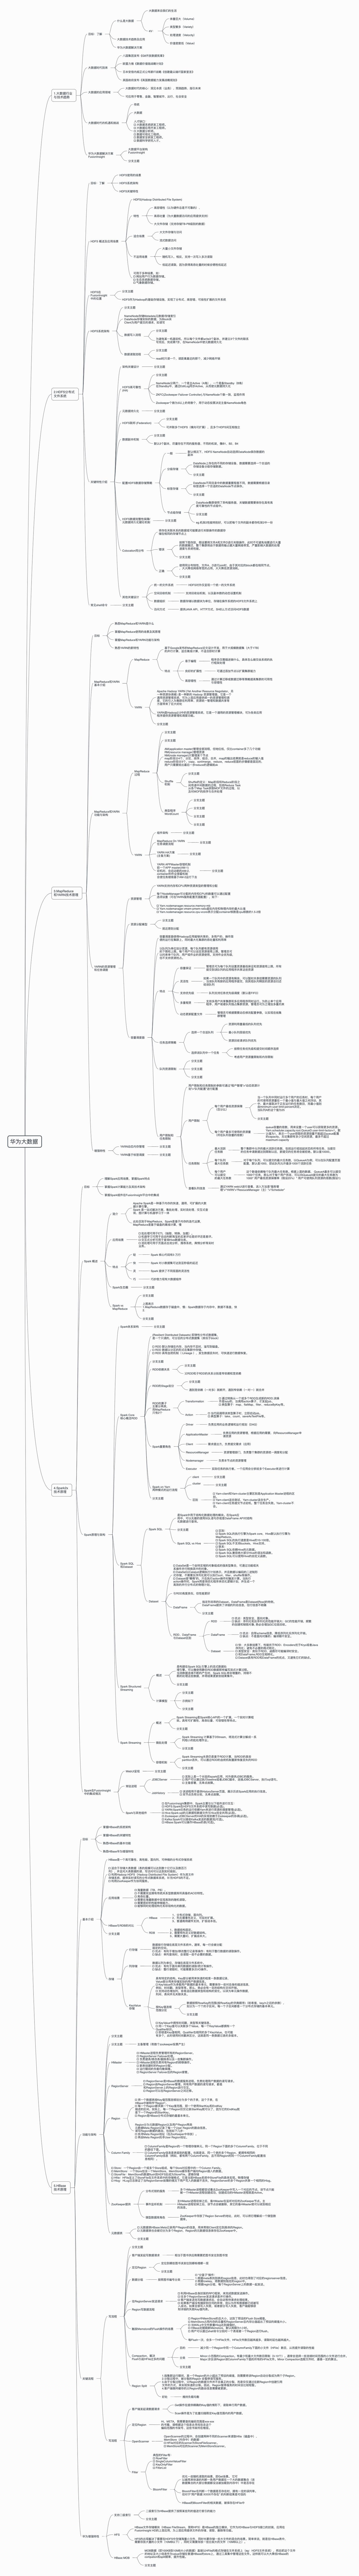 HCNA-Big_Data1